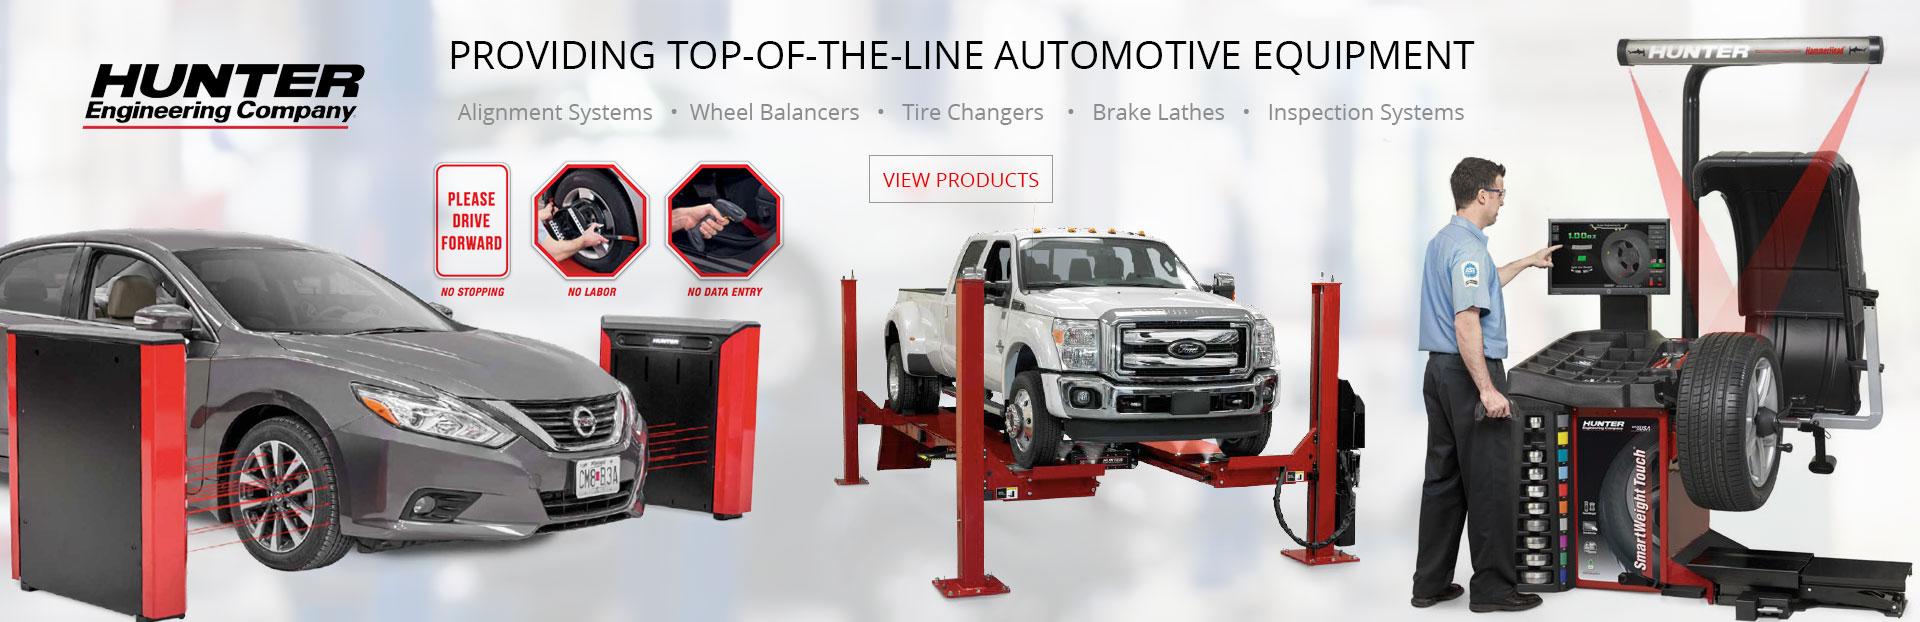 Providing Top of the line automotive equipment